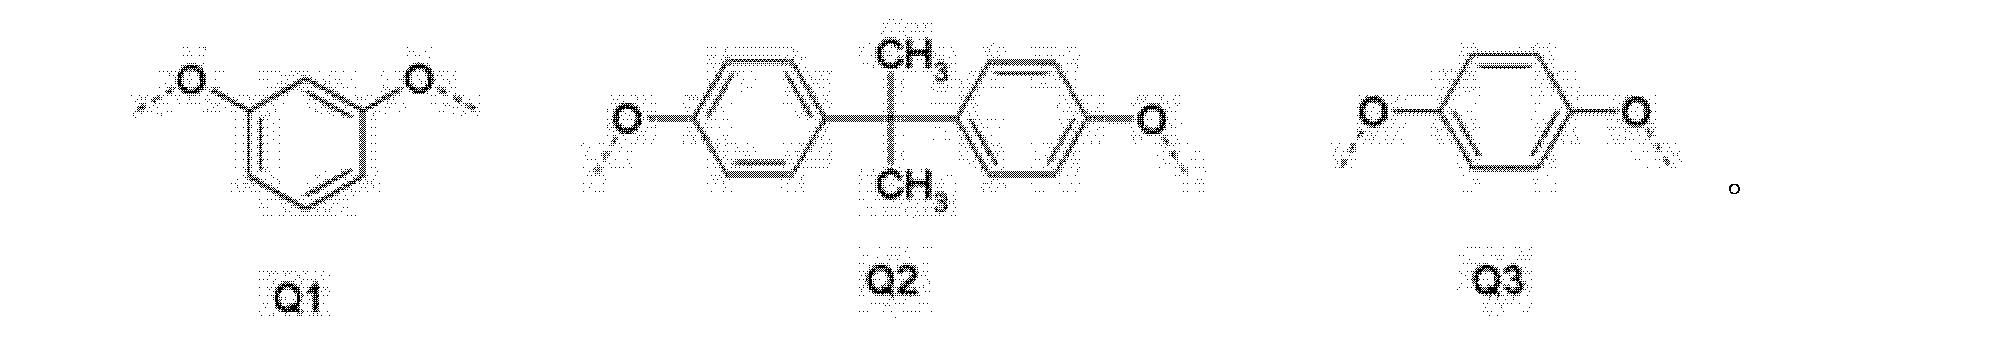 Figure CN102888086AD00102